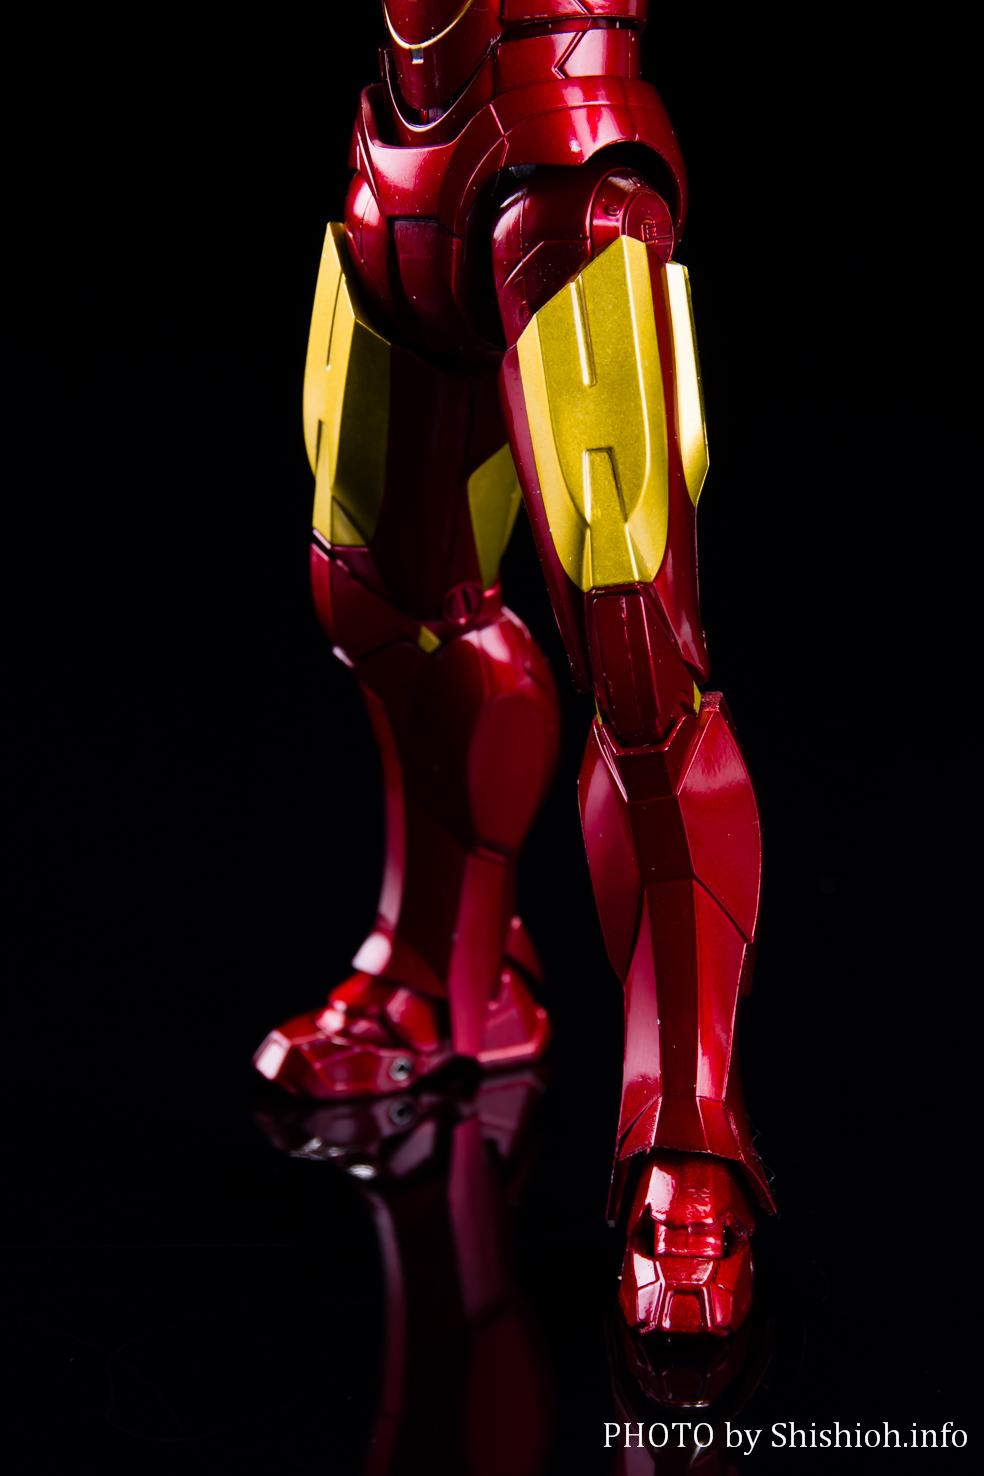 [Comentários] Marvel S.H.Figuarts - Página 4 HlybLBYa_o